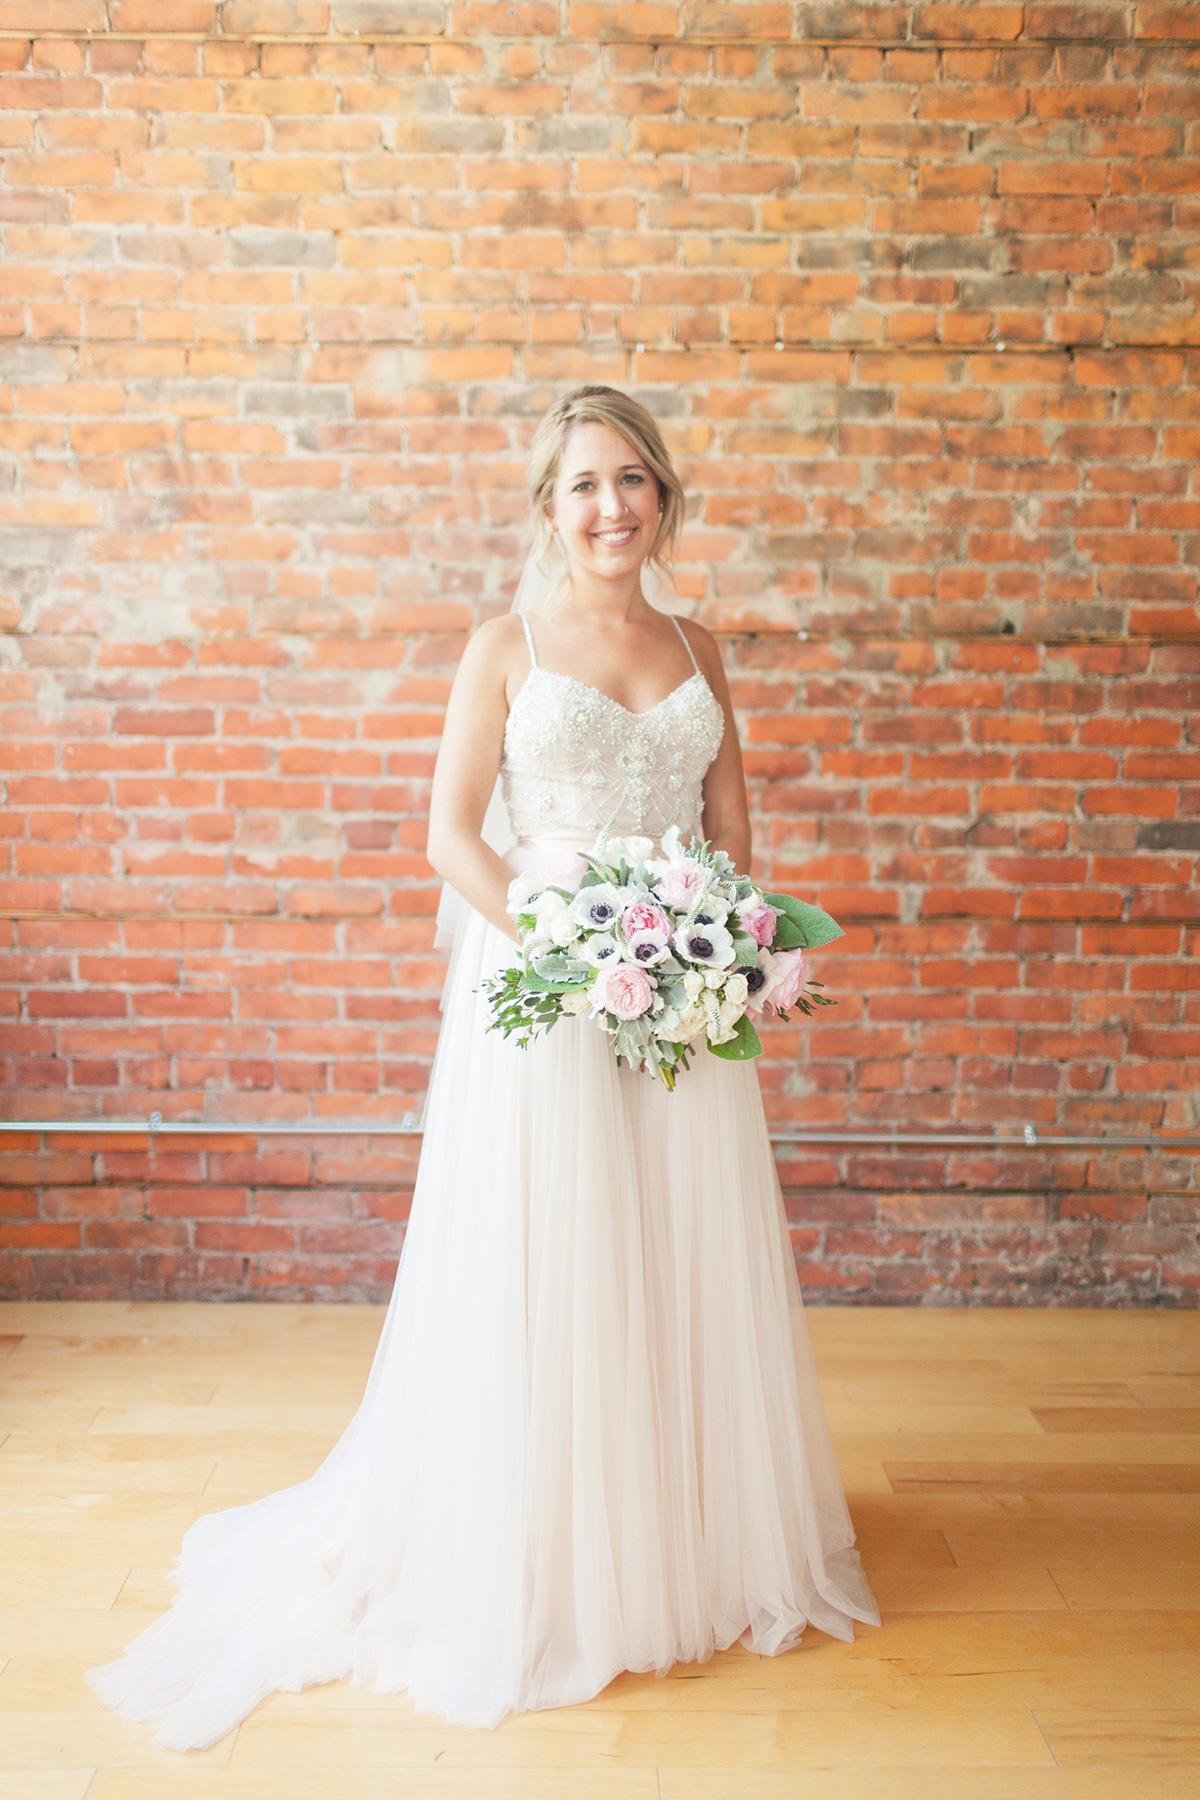 jennifer-xu-photography-vineyard-bride-swish-list-spice-factory-hamilton-wedding-15.jpg